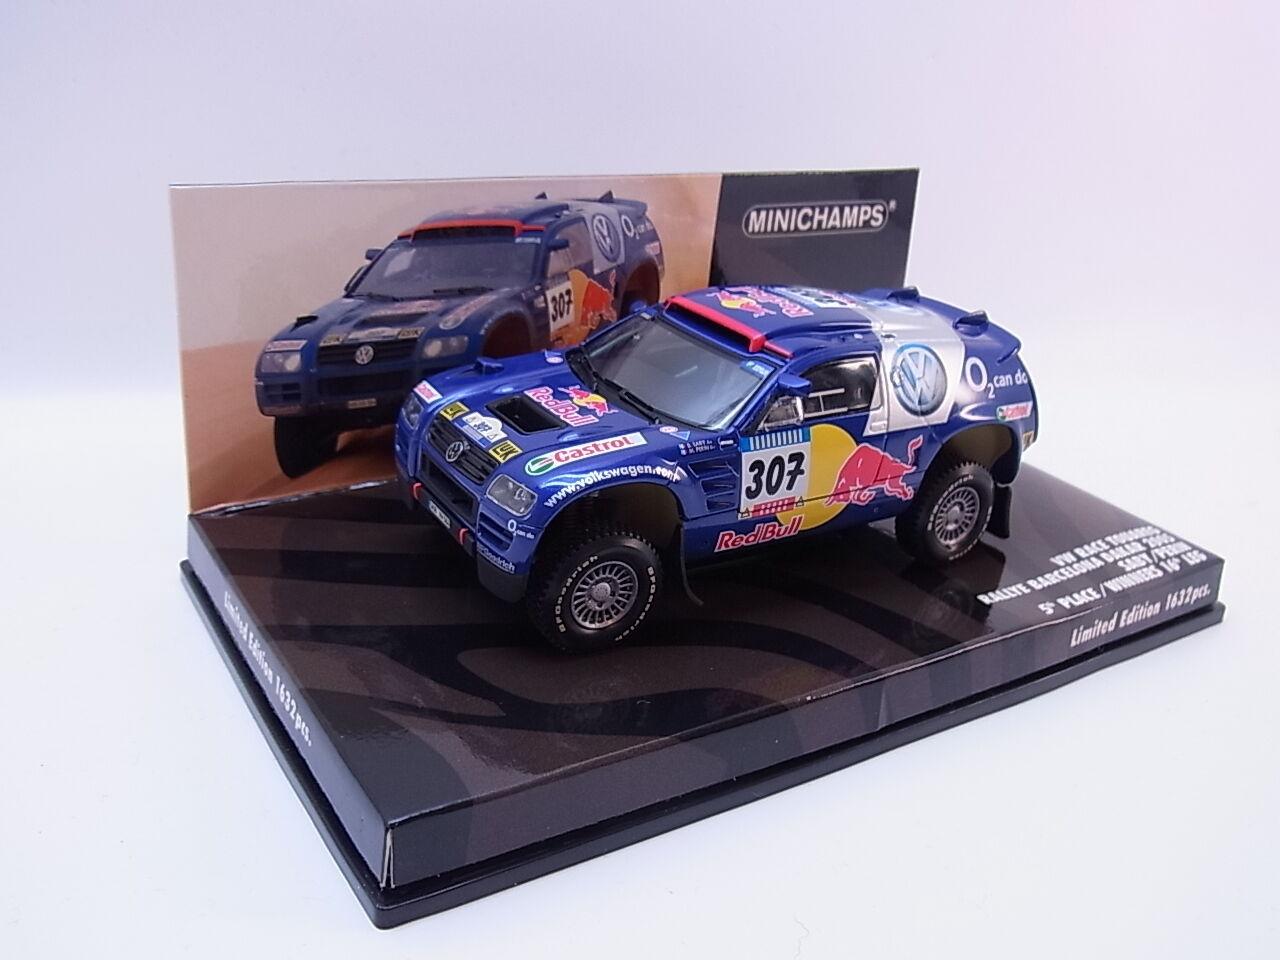 Lot 26219   MINICHAMPS 436055307 VW Race Touareg Dakar 2005 Voiture Miniature 1 43 neuf dans sa boîte